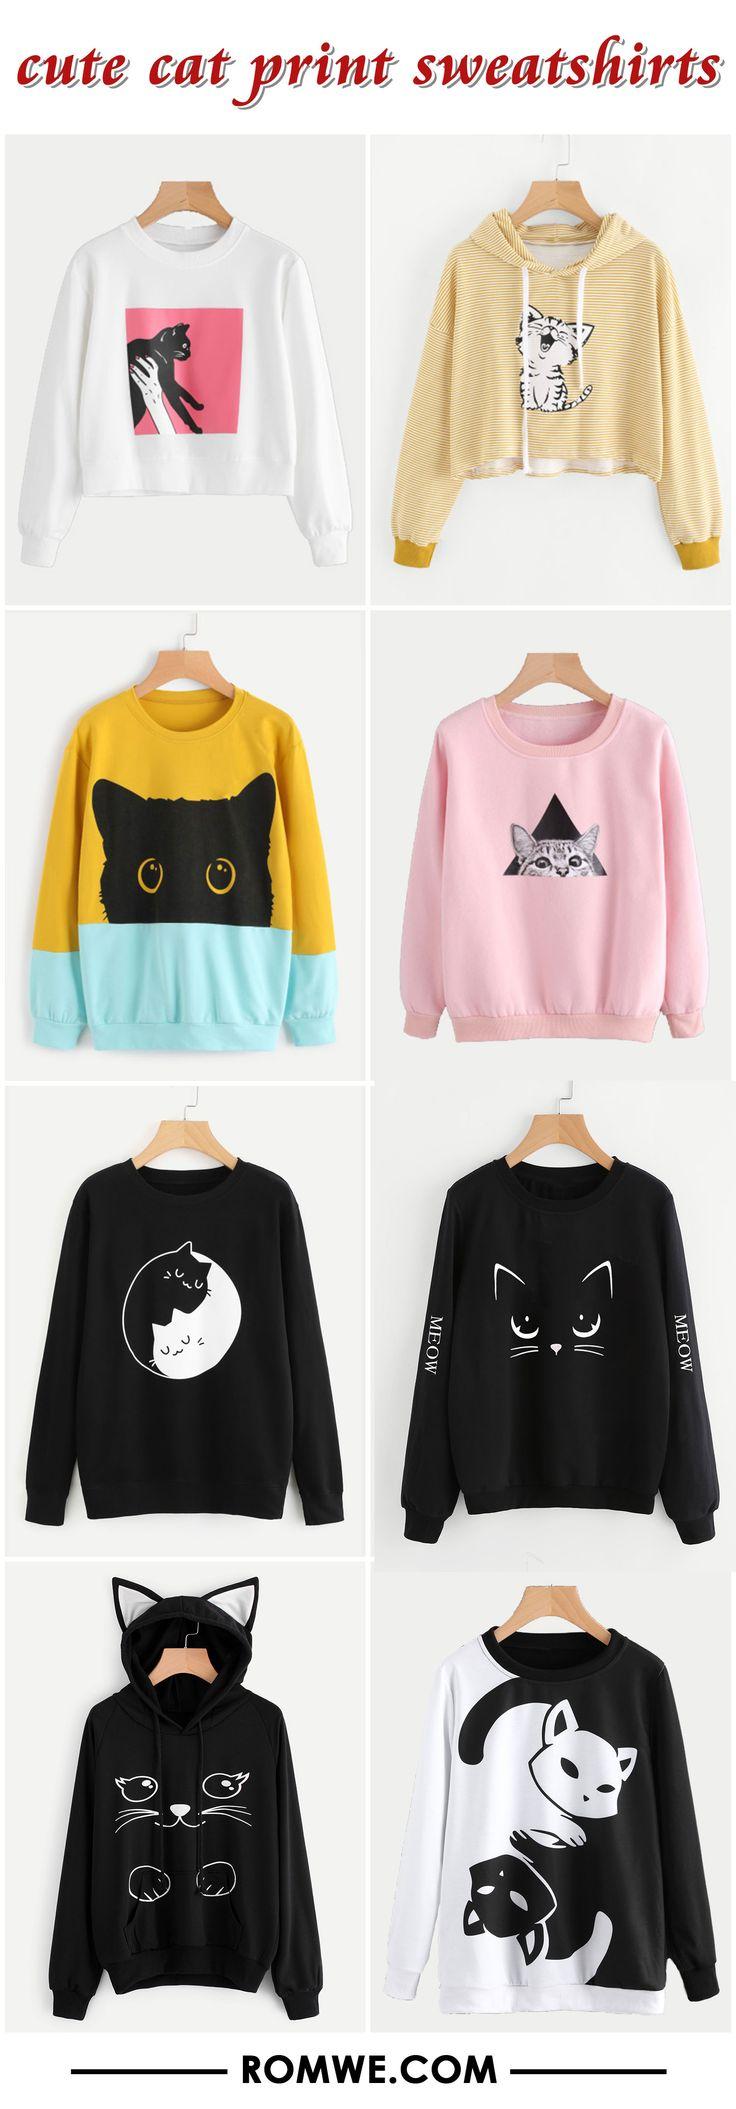 black friday sale - cute cat sweatshirts from romwe.com